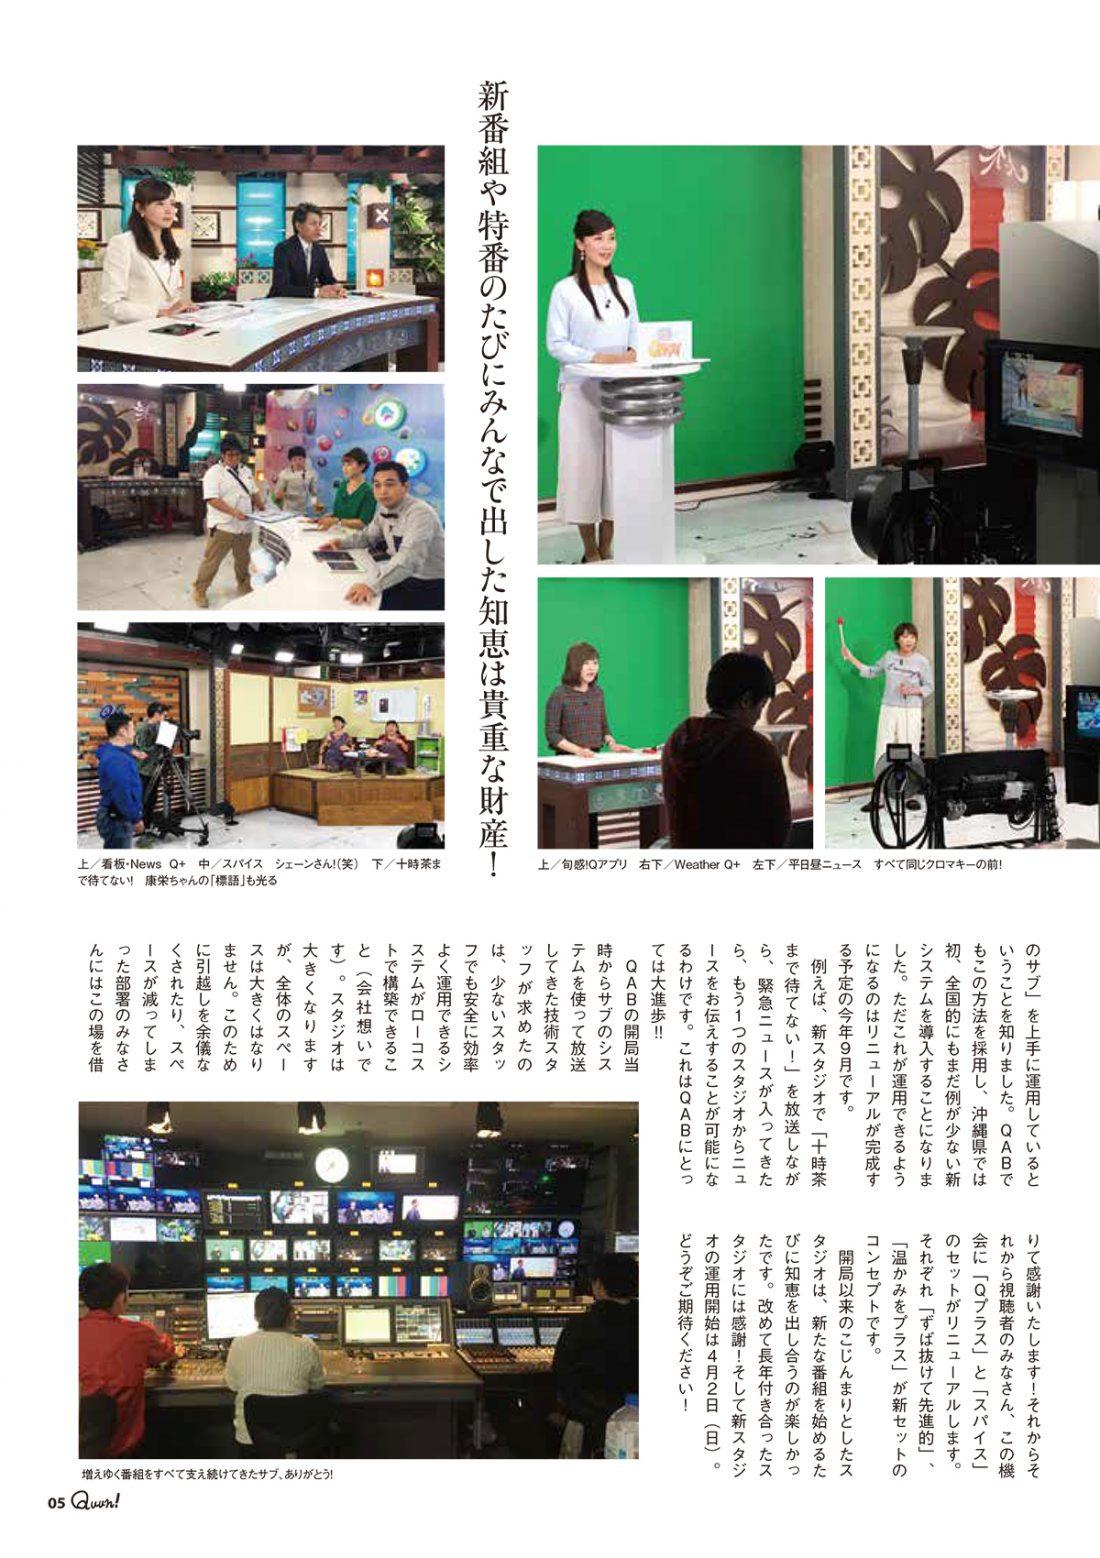 https://www.qab.co.jp/qgoro/wp-content/uploads/quun_0707-1100x1558.jpg